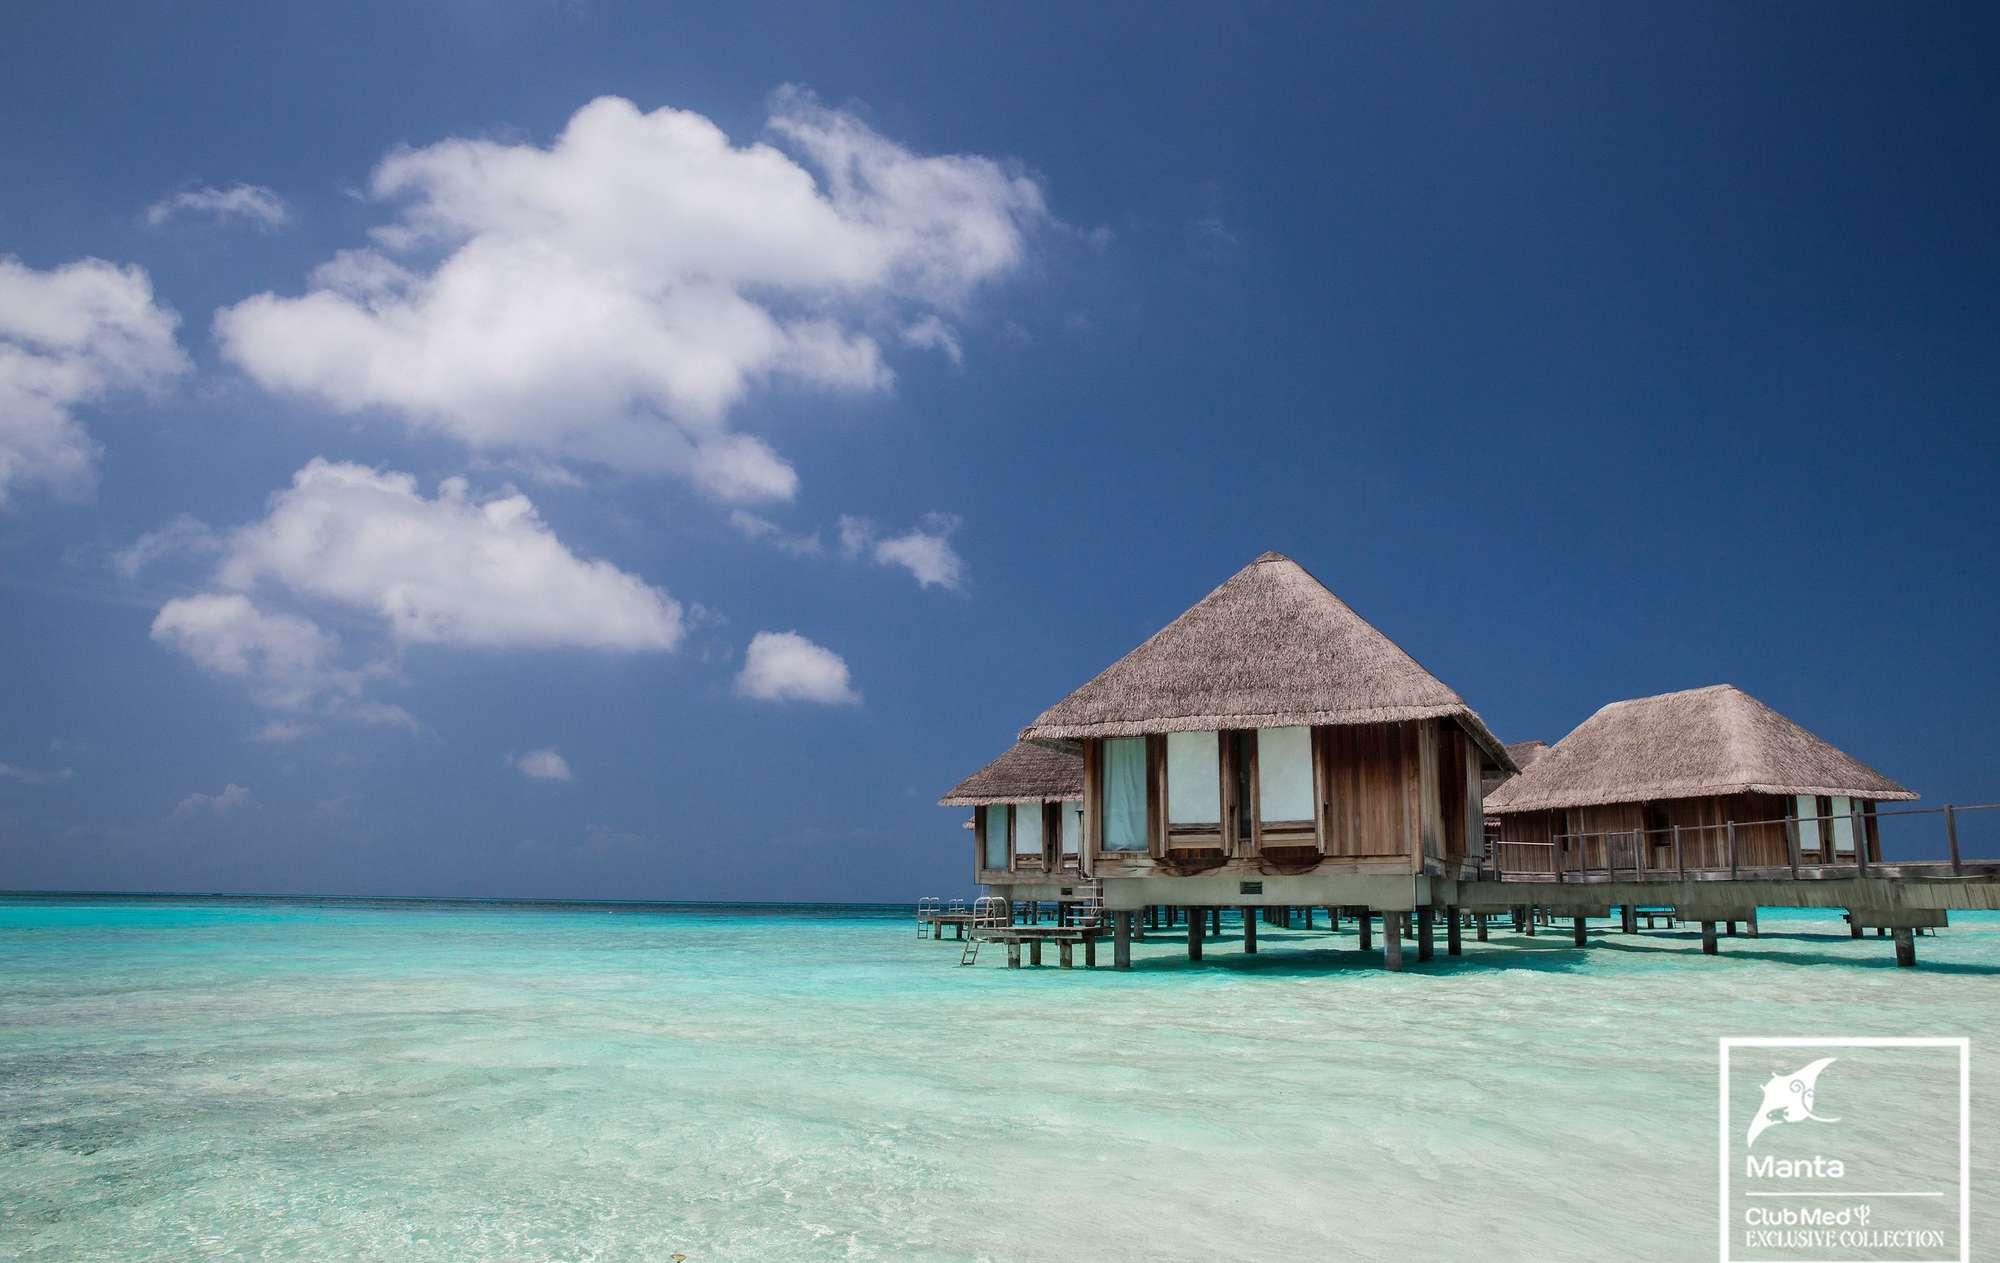 Club_med_Asie_et_Ocean_indien_Kani_suite_pillotis_1